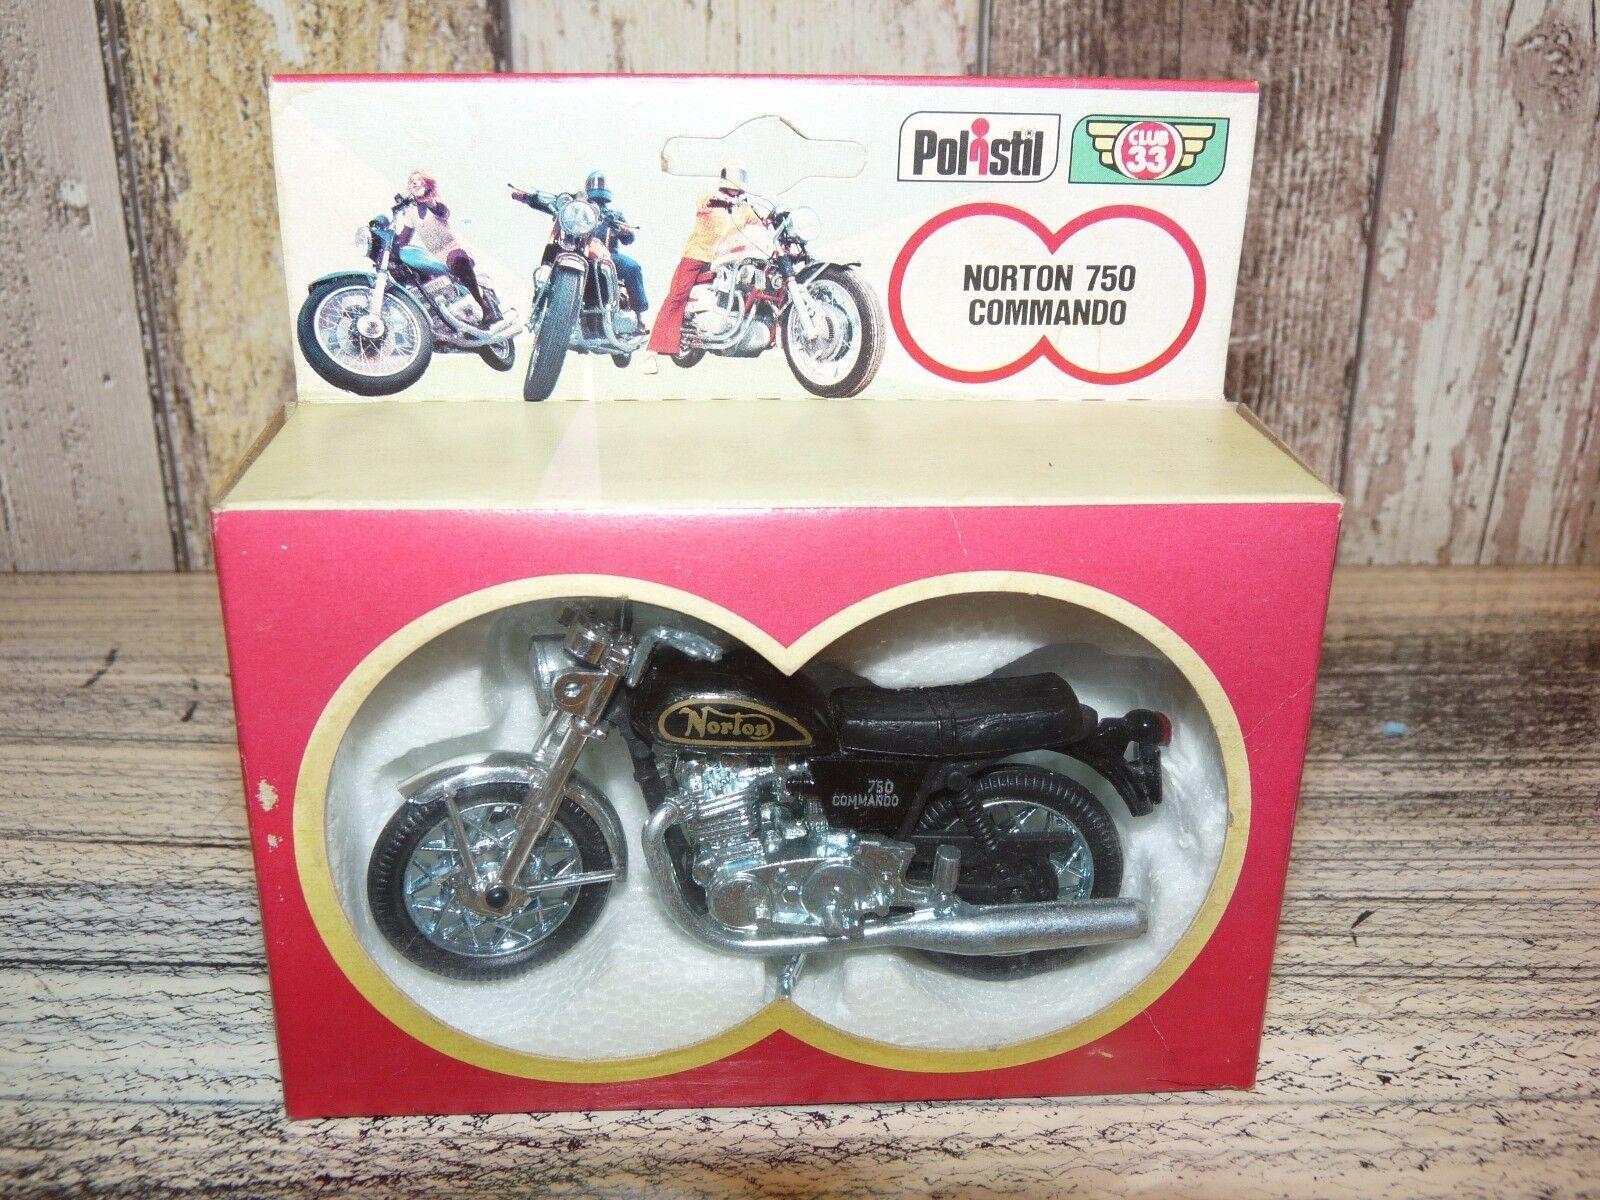 RARE POLISTIL Norton 750 Commando Motor Motorcycle Toy Sc.1 24 BOX Club 33 1970